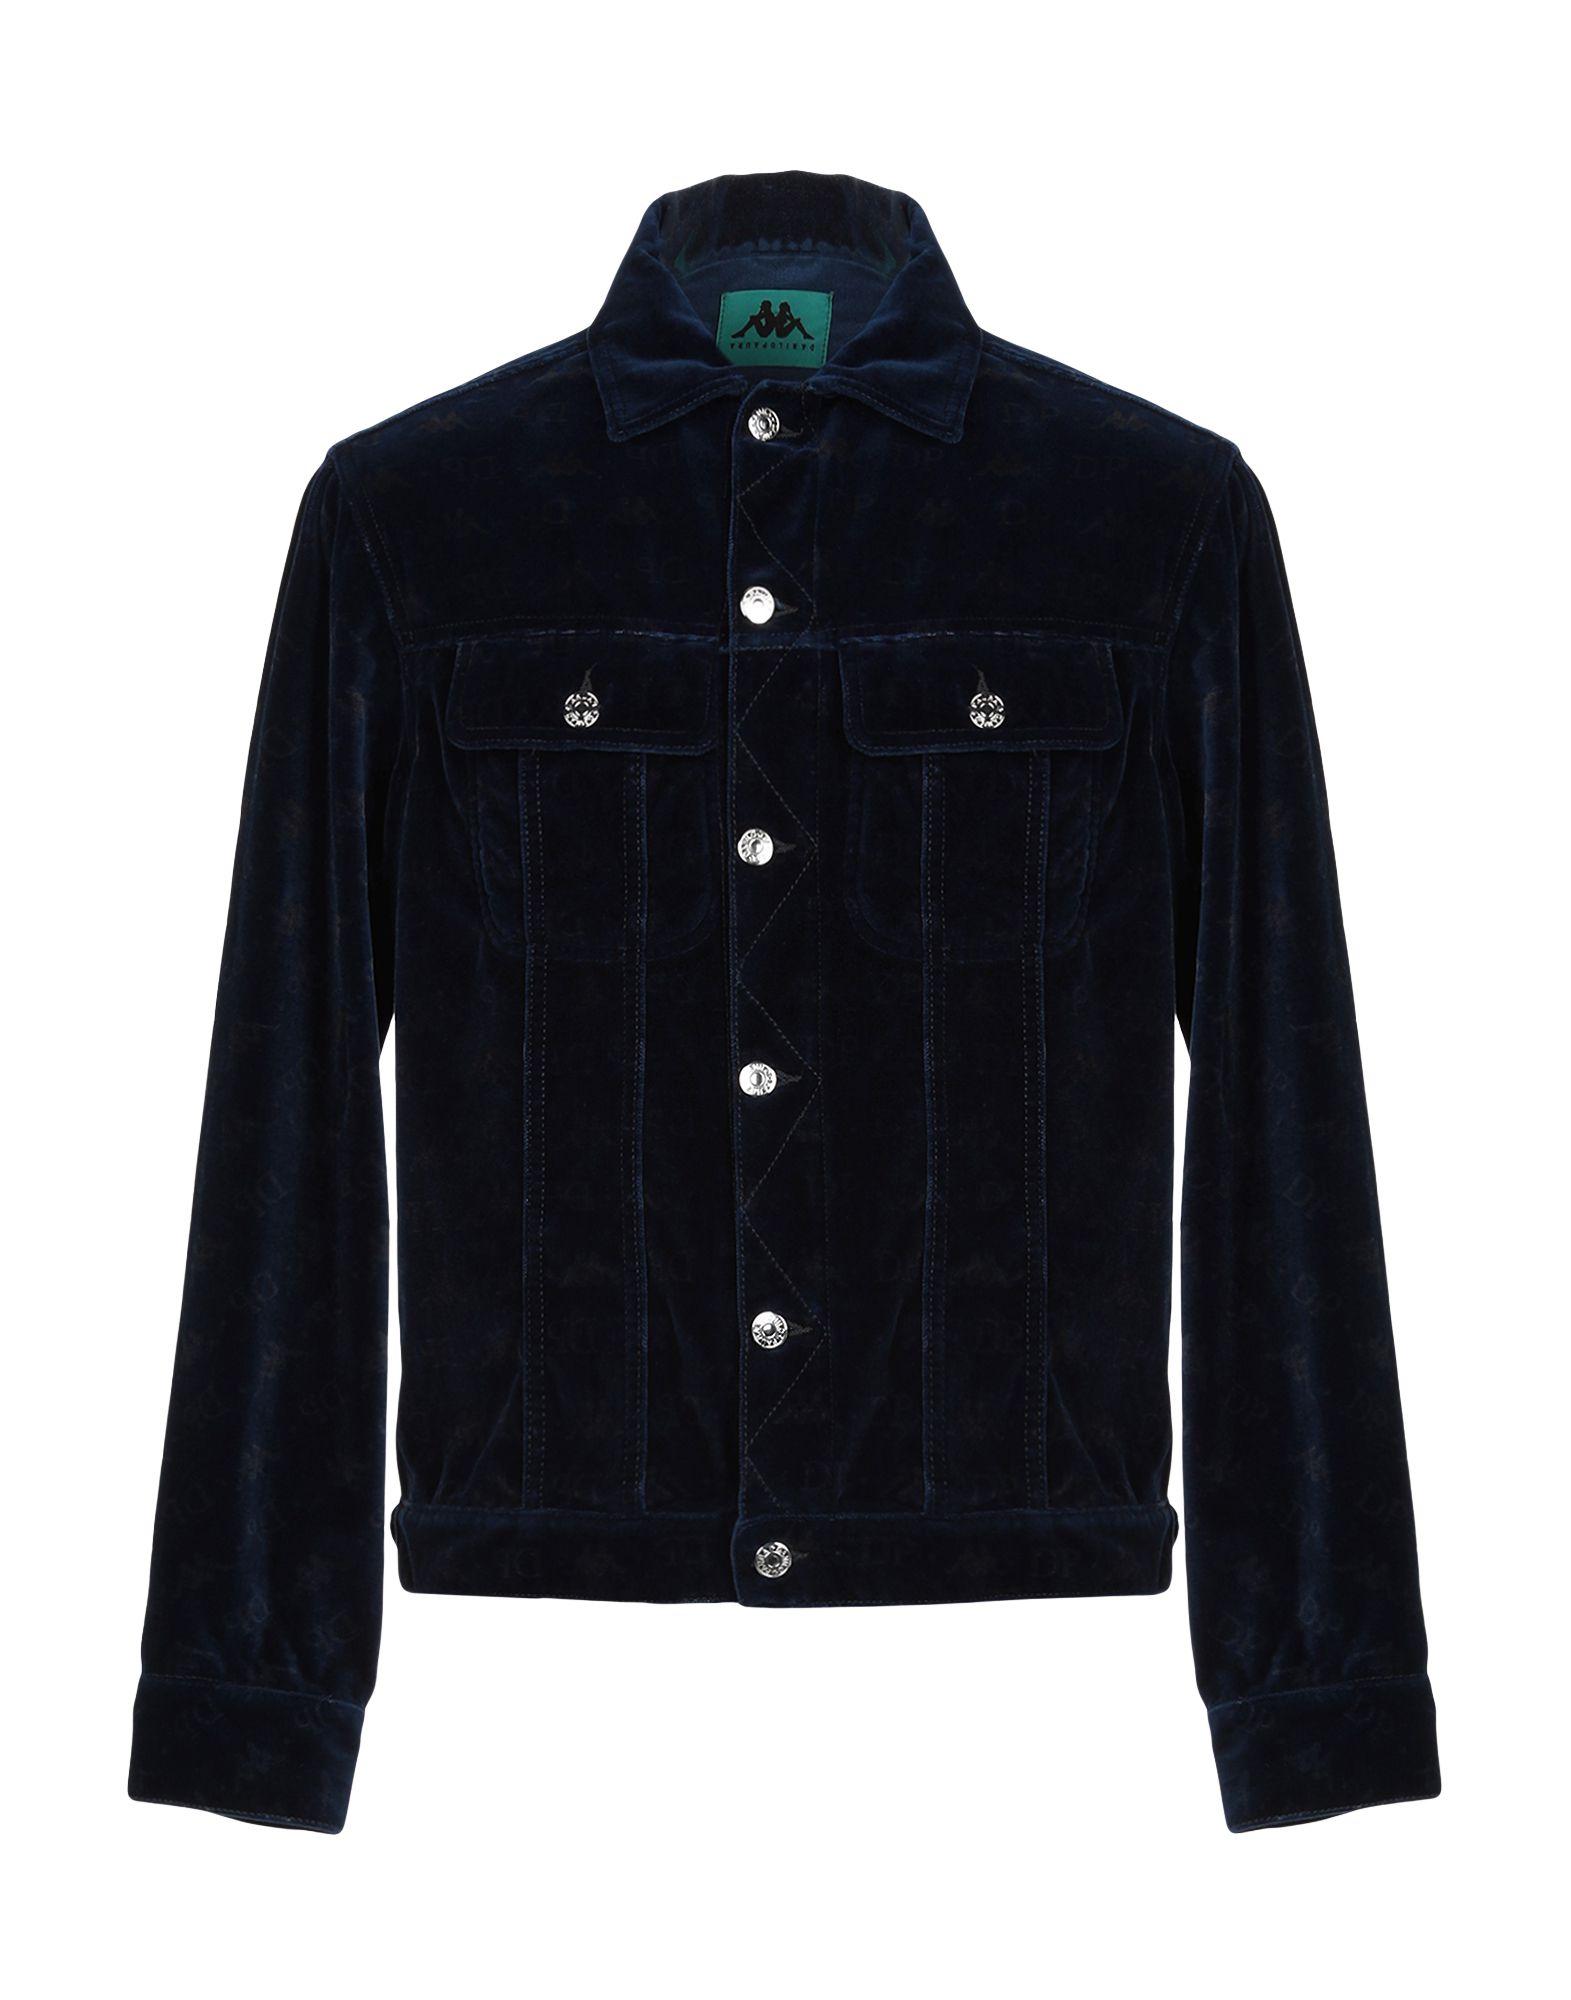 DANILO PAURA x KAPPA Куртка